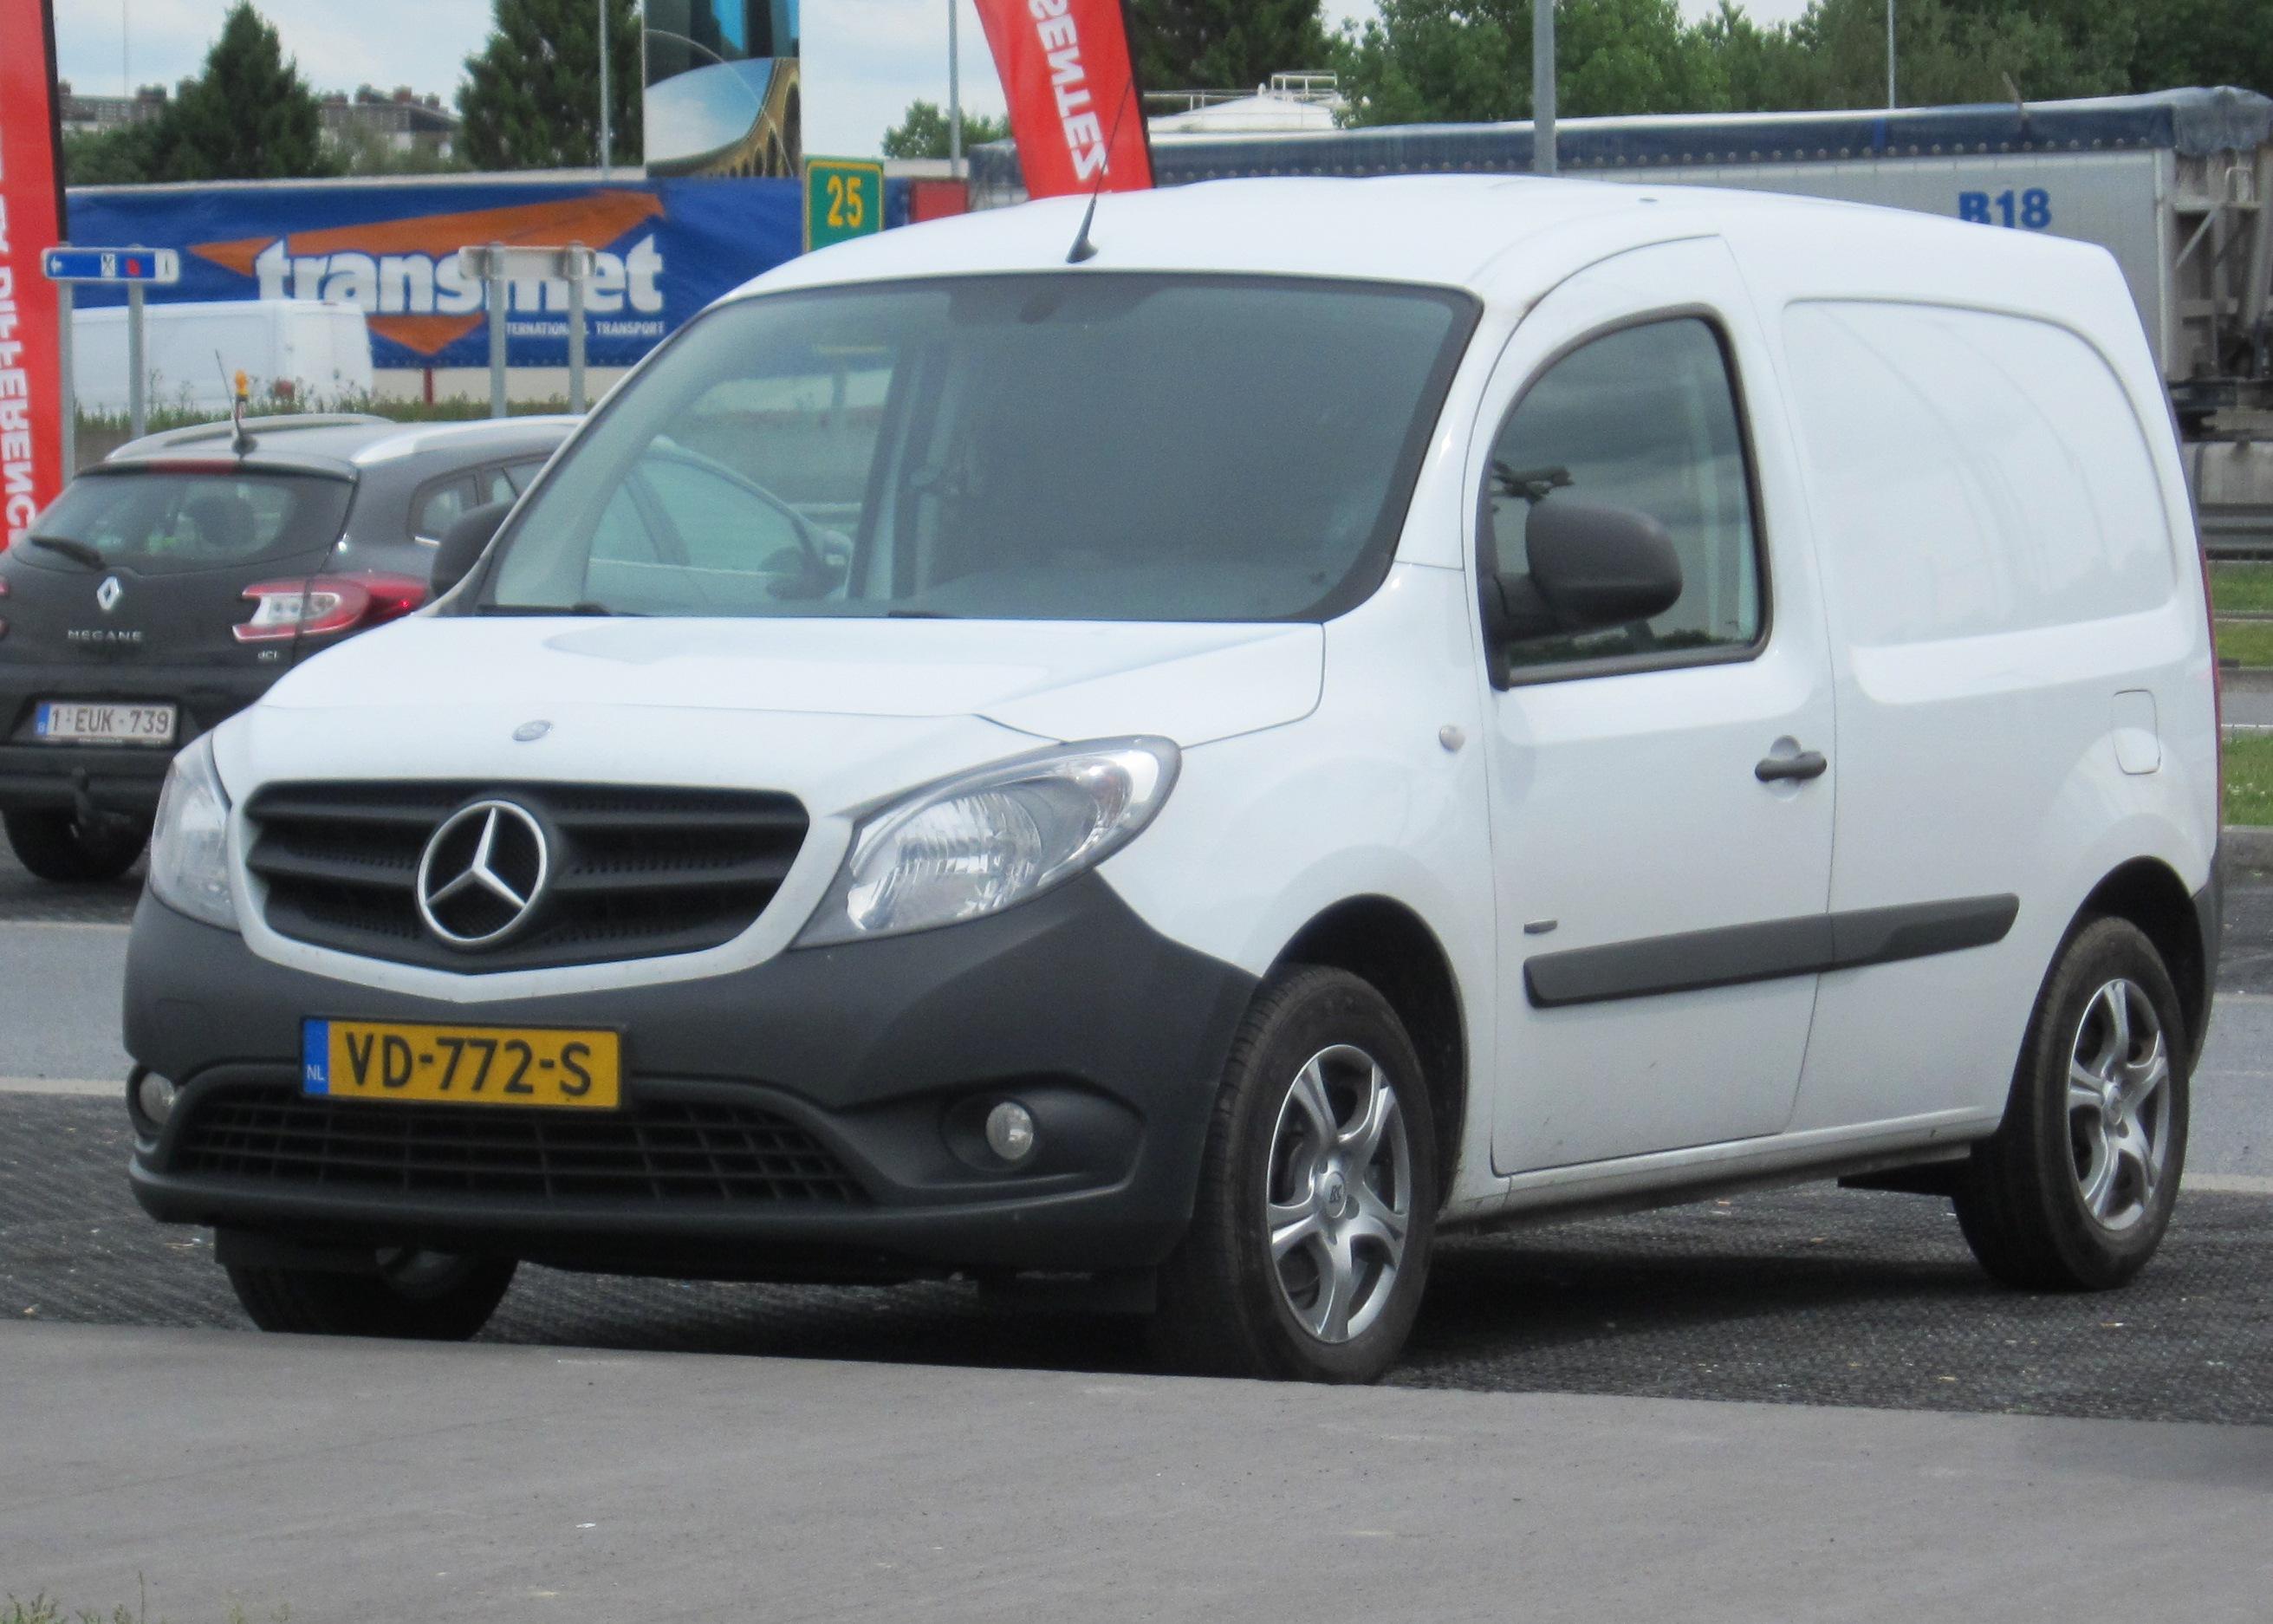 Mercedes Benz Van >> File:Mercedes-Benz Citan panel van aka Kangoo by Mercedes.JPG - Wikimedia Commons